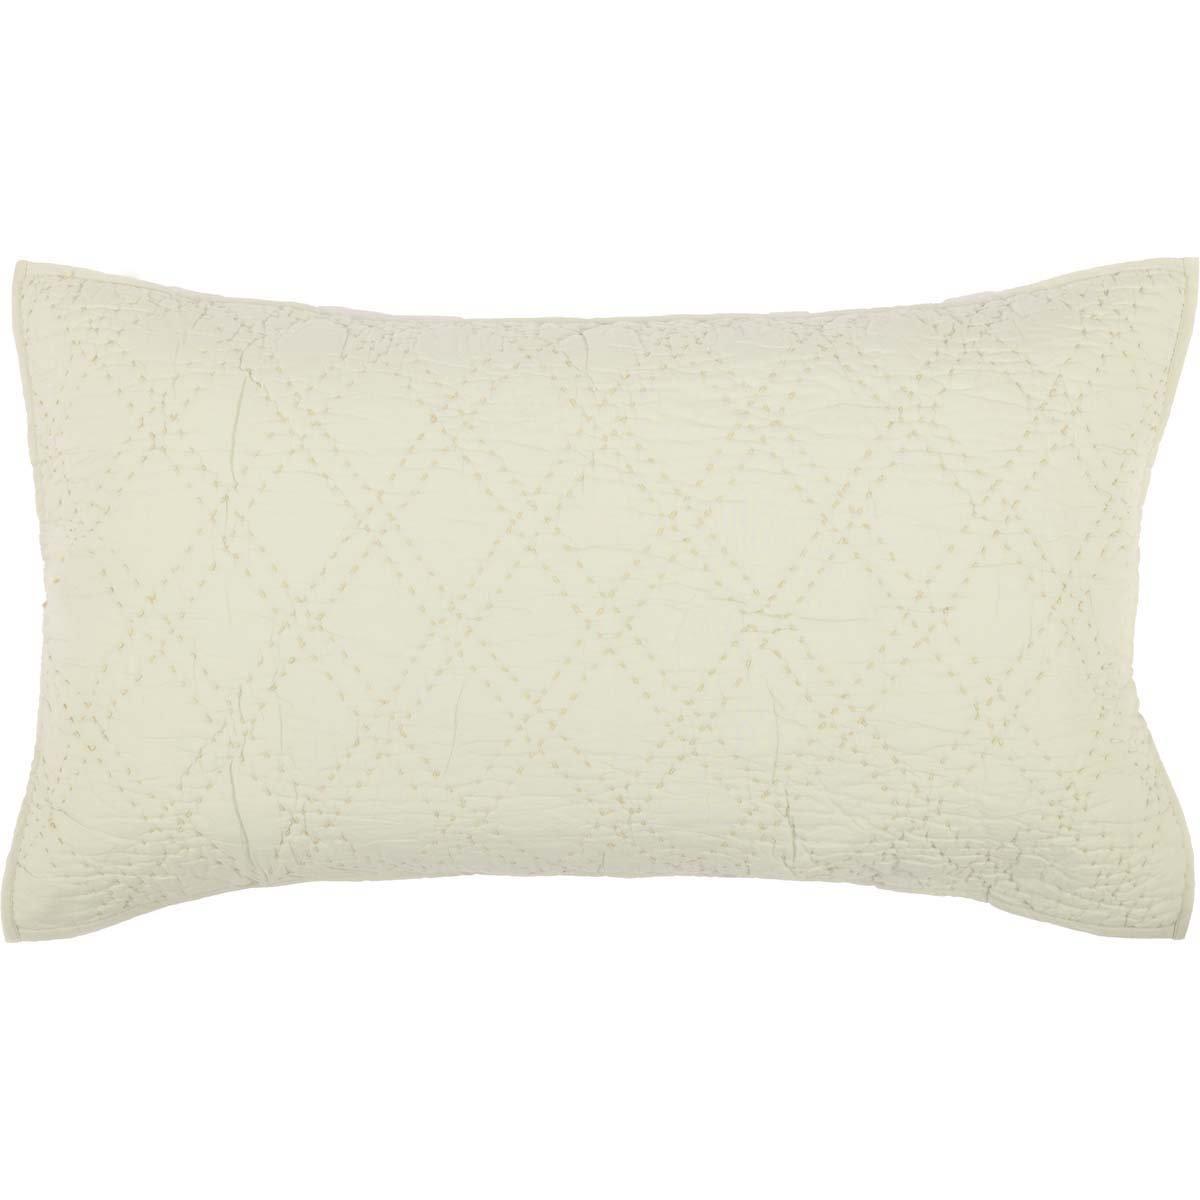 VHC Brands Farmhouse Bedding - Casey White Sham, King, Parchment